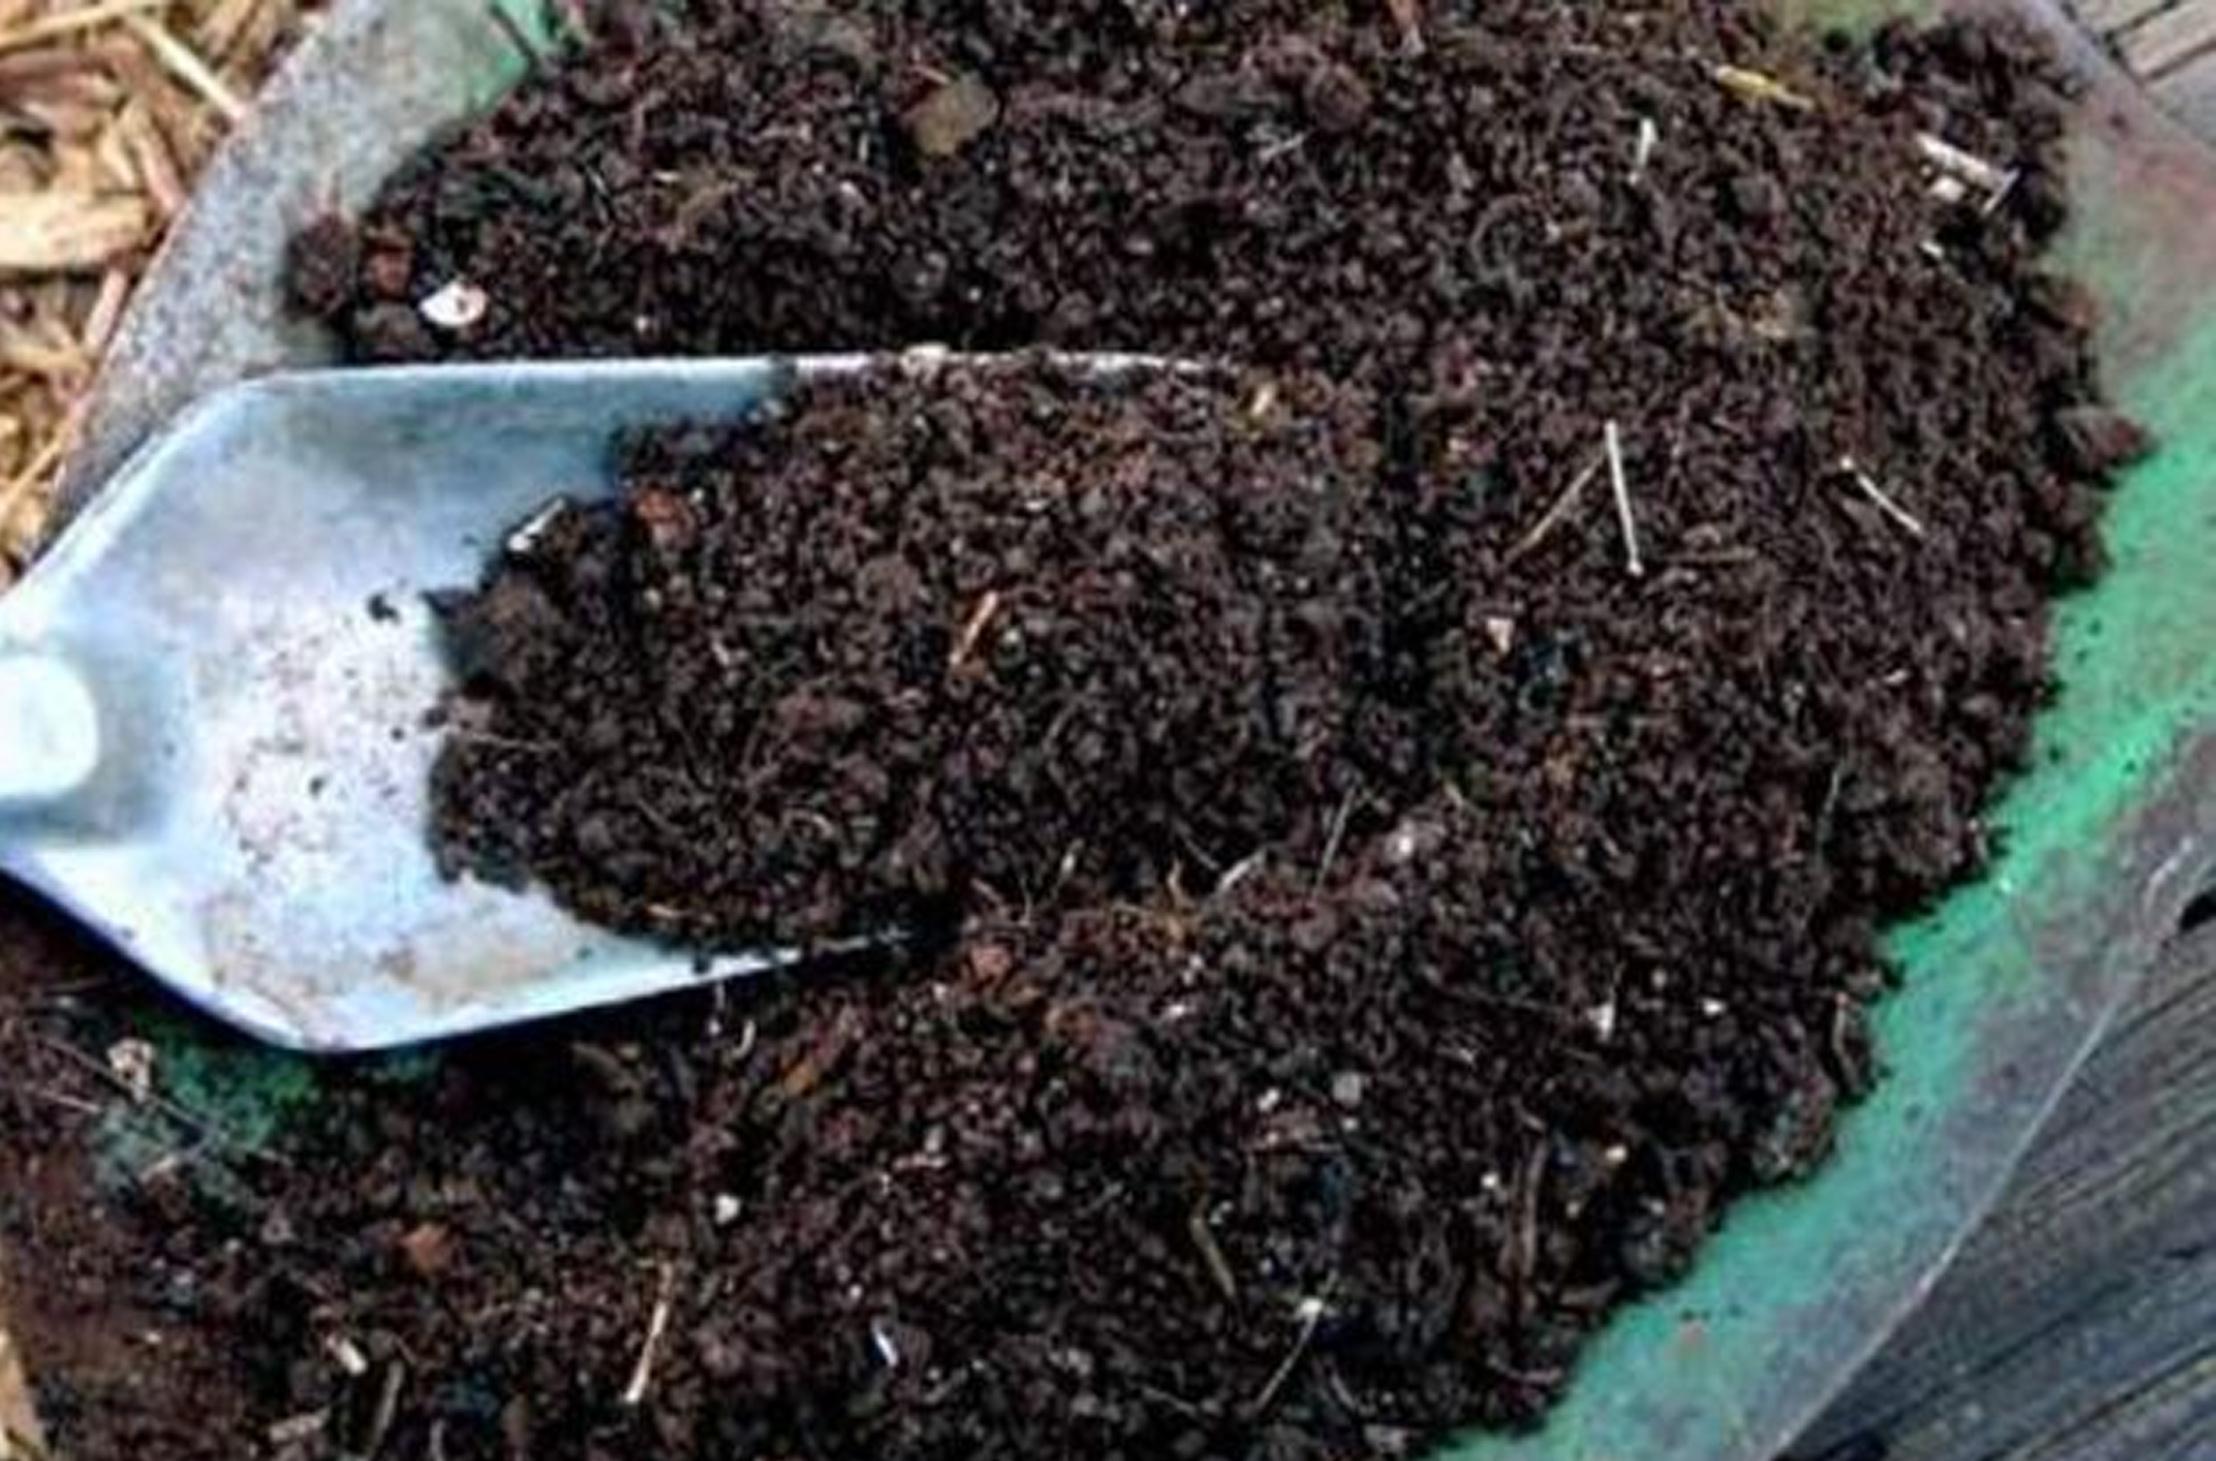 Pupuk Organik Jadi Dasar Strategi Peningkatan Pertanian